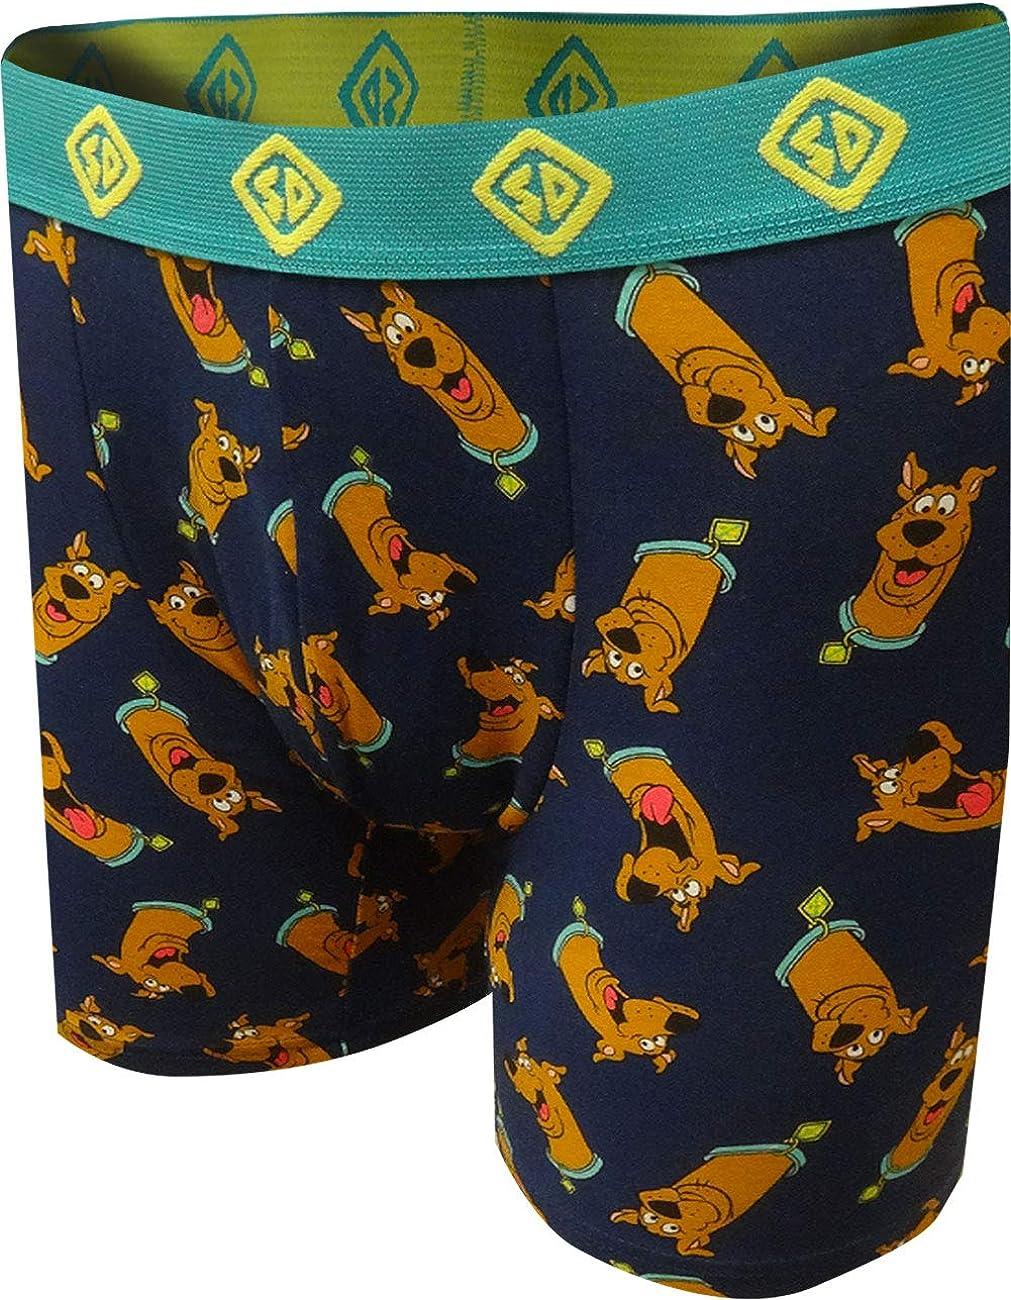 Underboss Men's Recommendation Scooby Doo Print Las Vegas Mall Briefs Boxer Heads